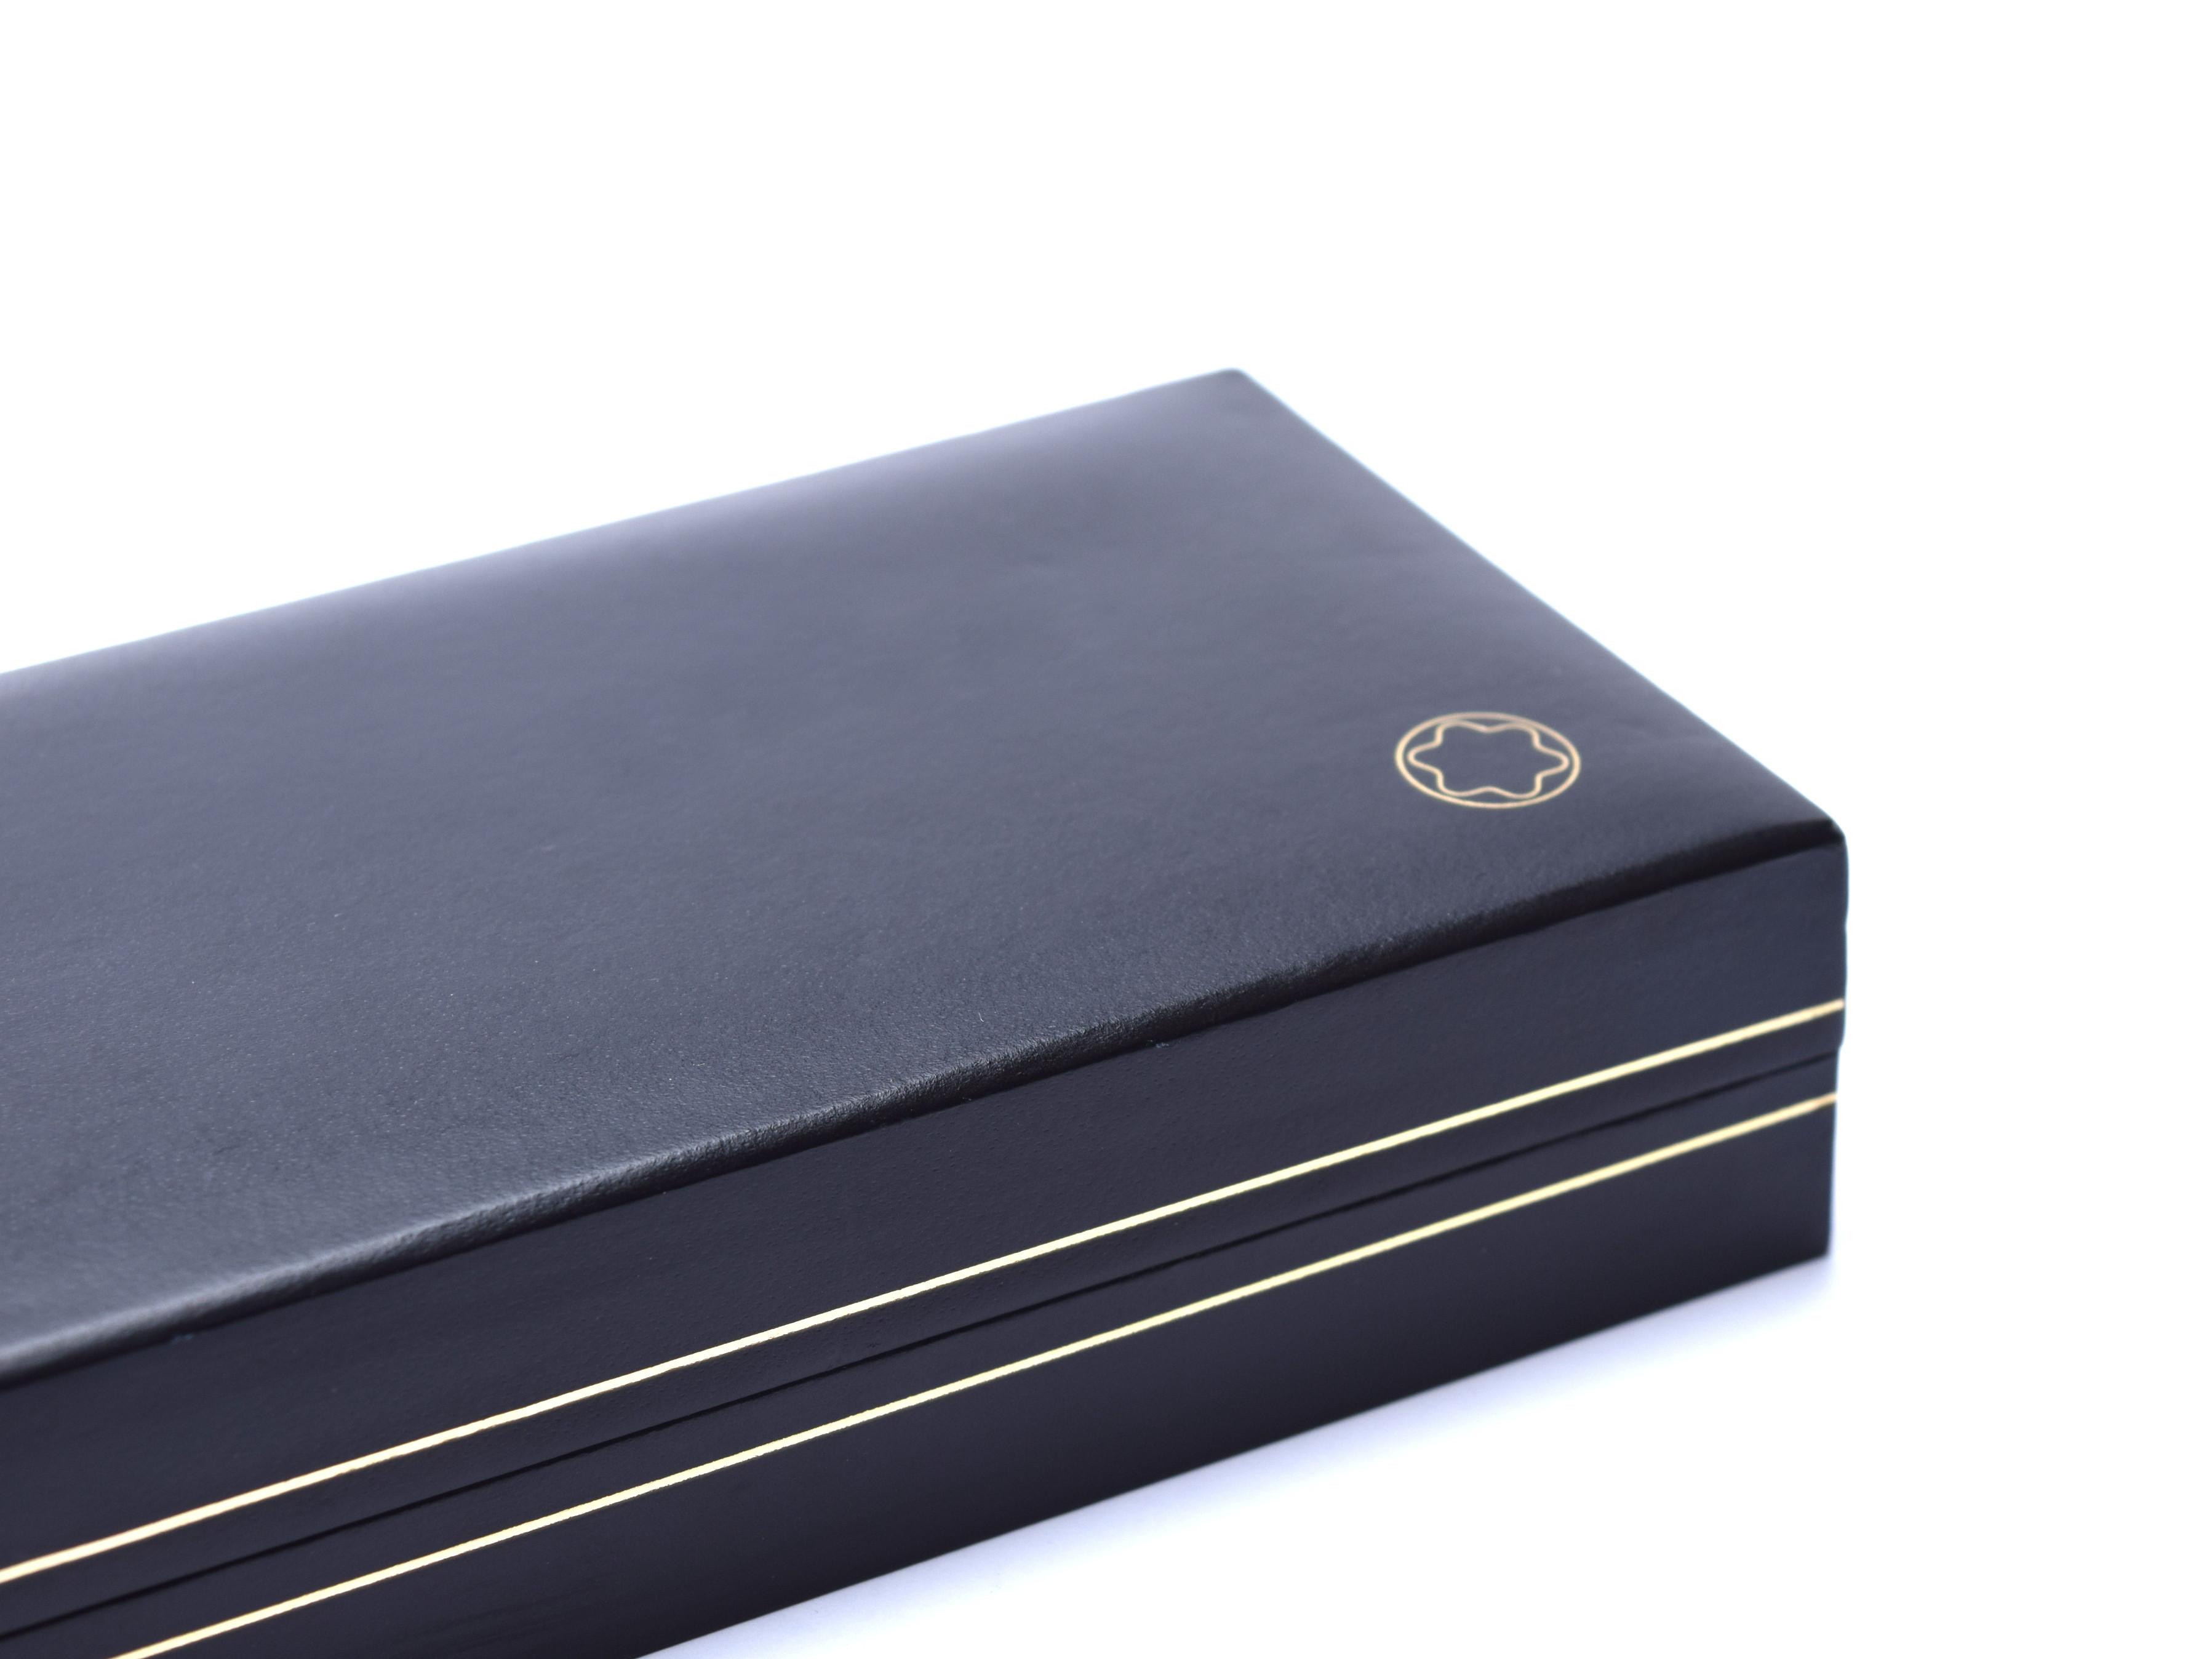 4af0fee4cd8b Rosewood Pen with Presentation Box - Brown's Trophies